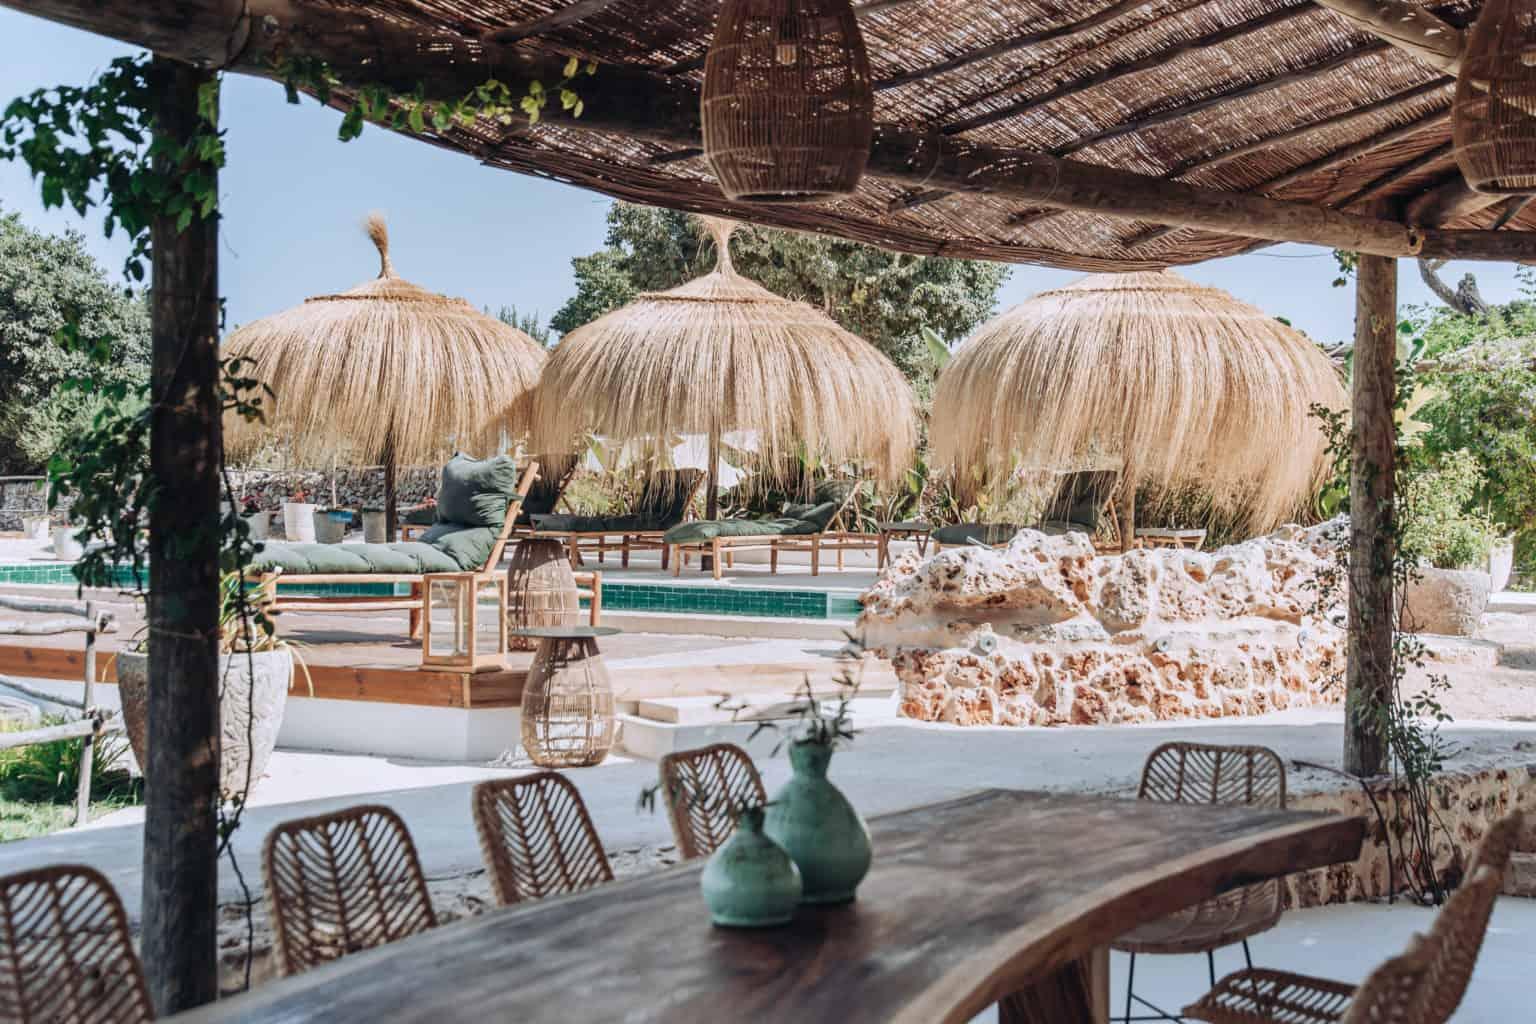 Villa Rental Mallorca - 4 Bedrooms - Balearic Bliss - Only Summer - sea grass lightshades